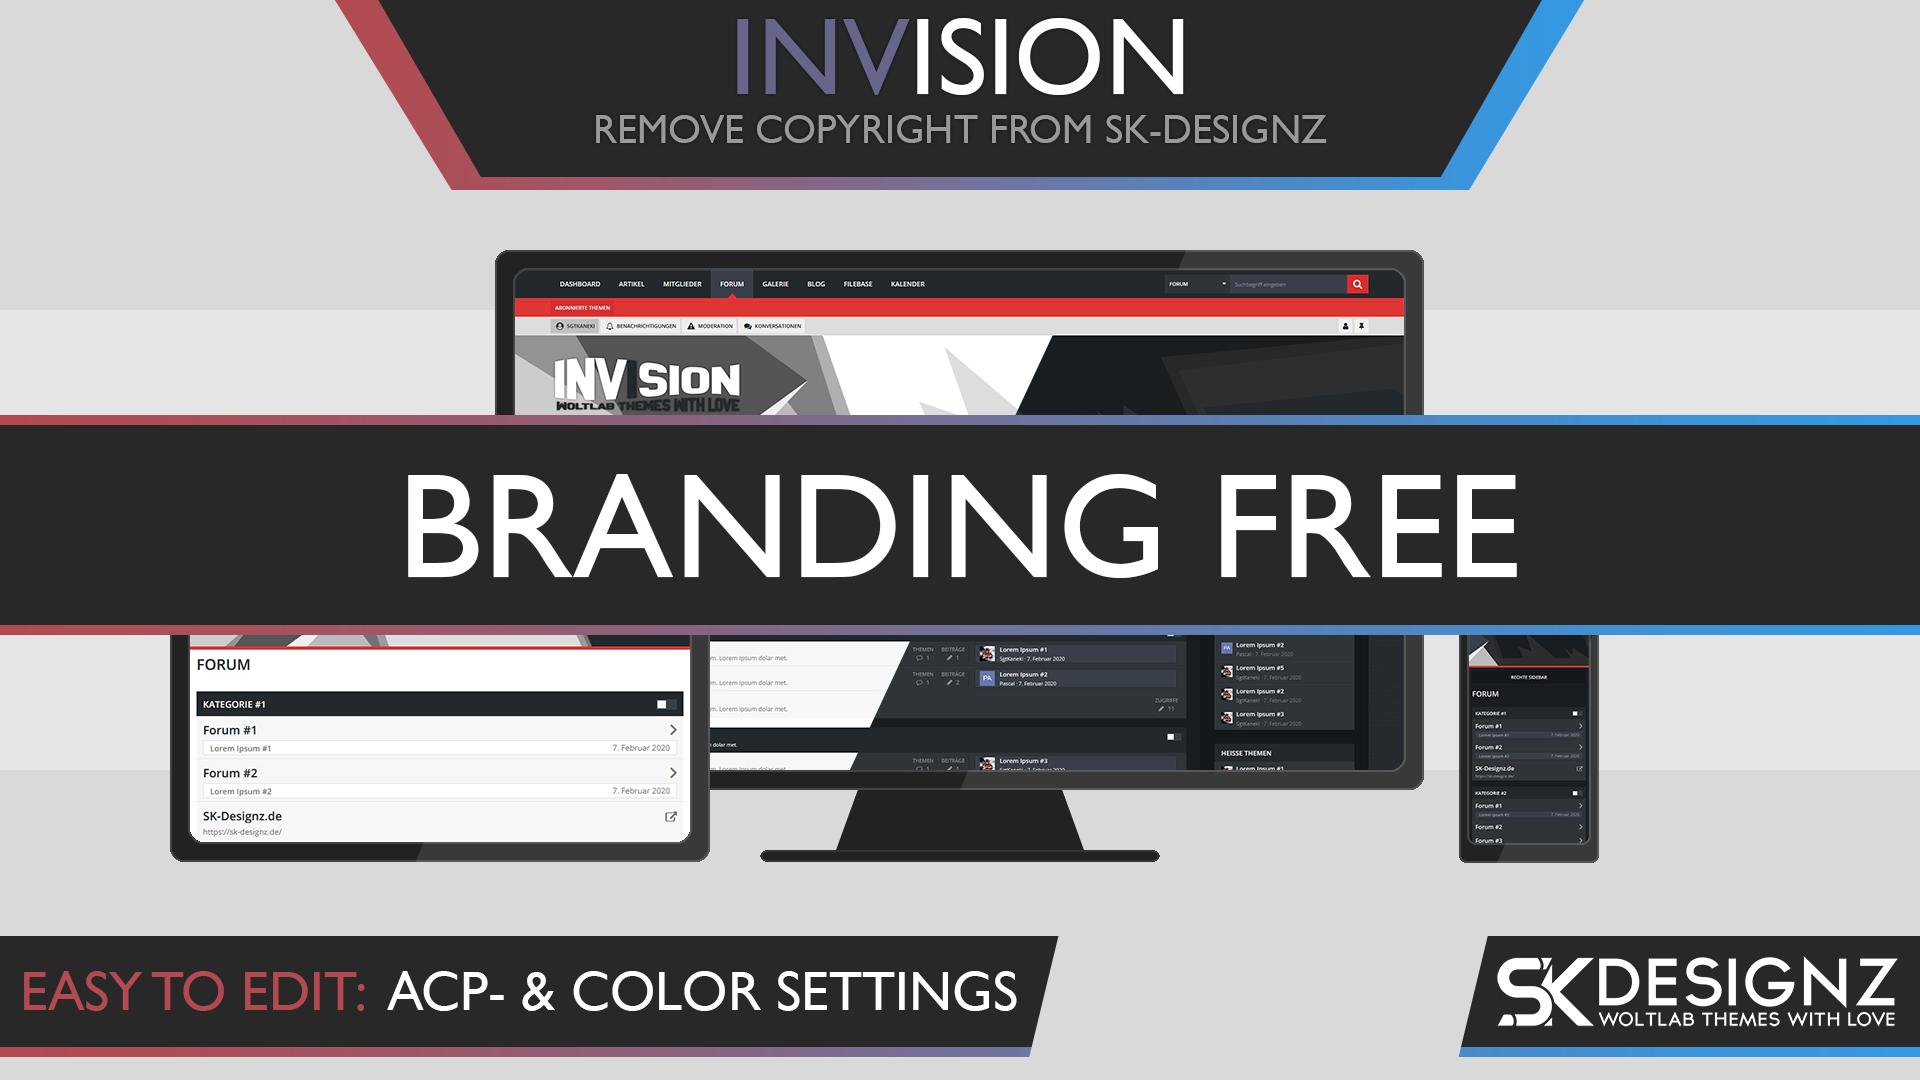 Invision - Branding Free